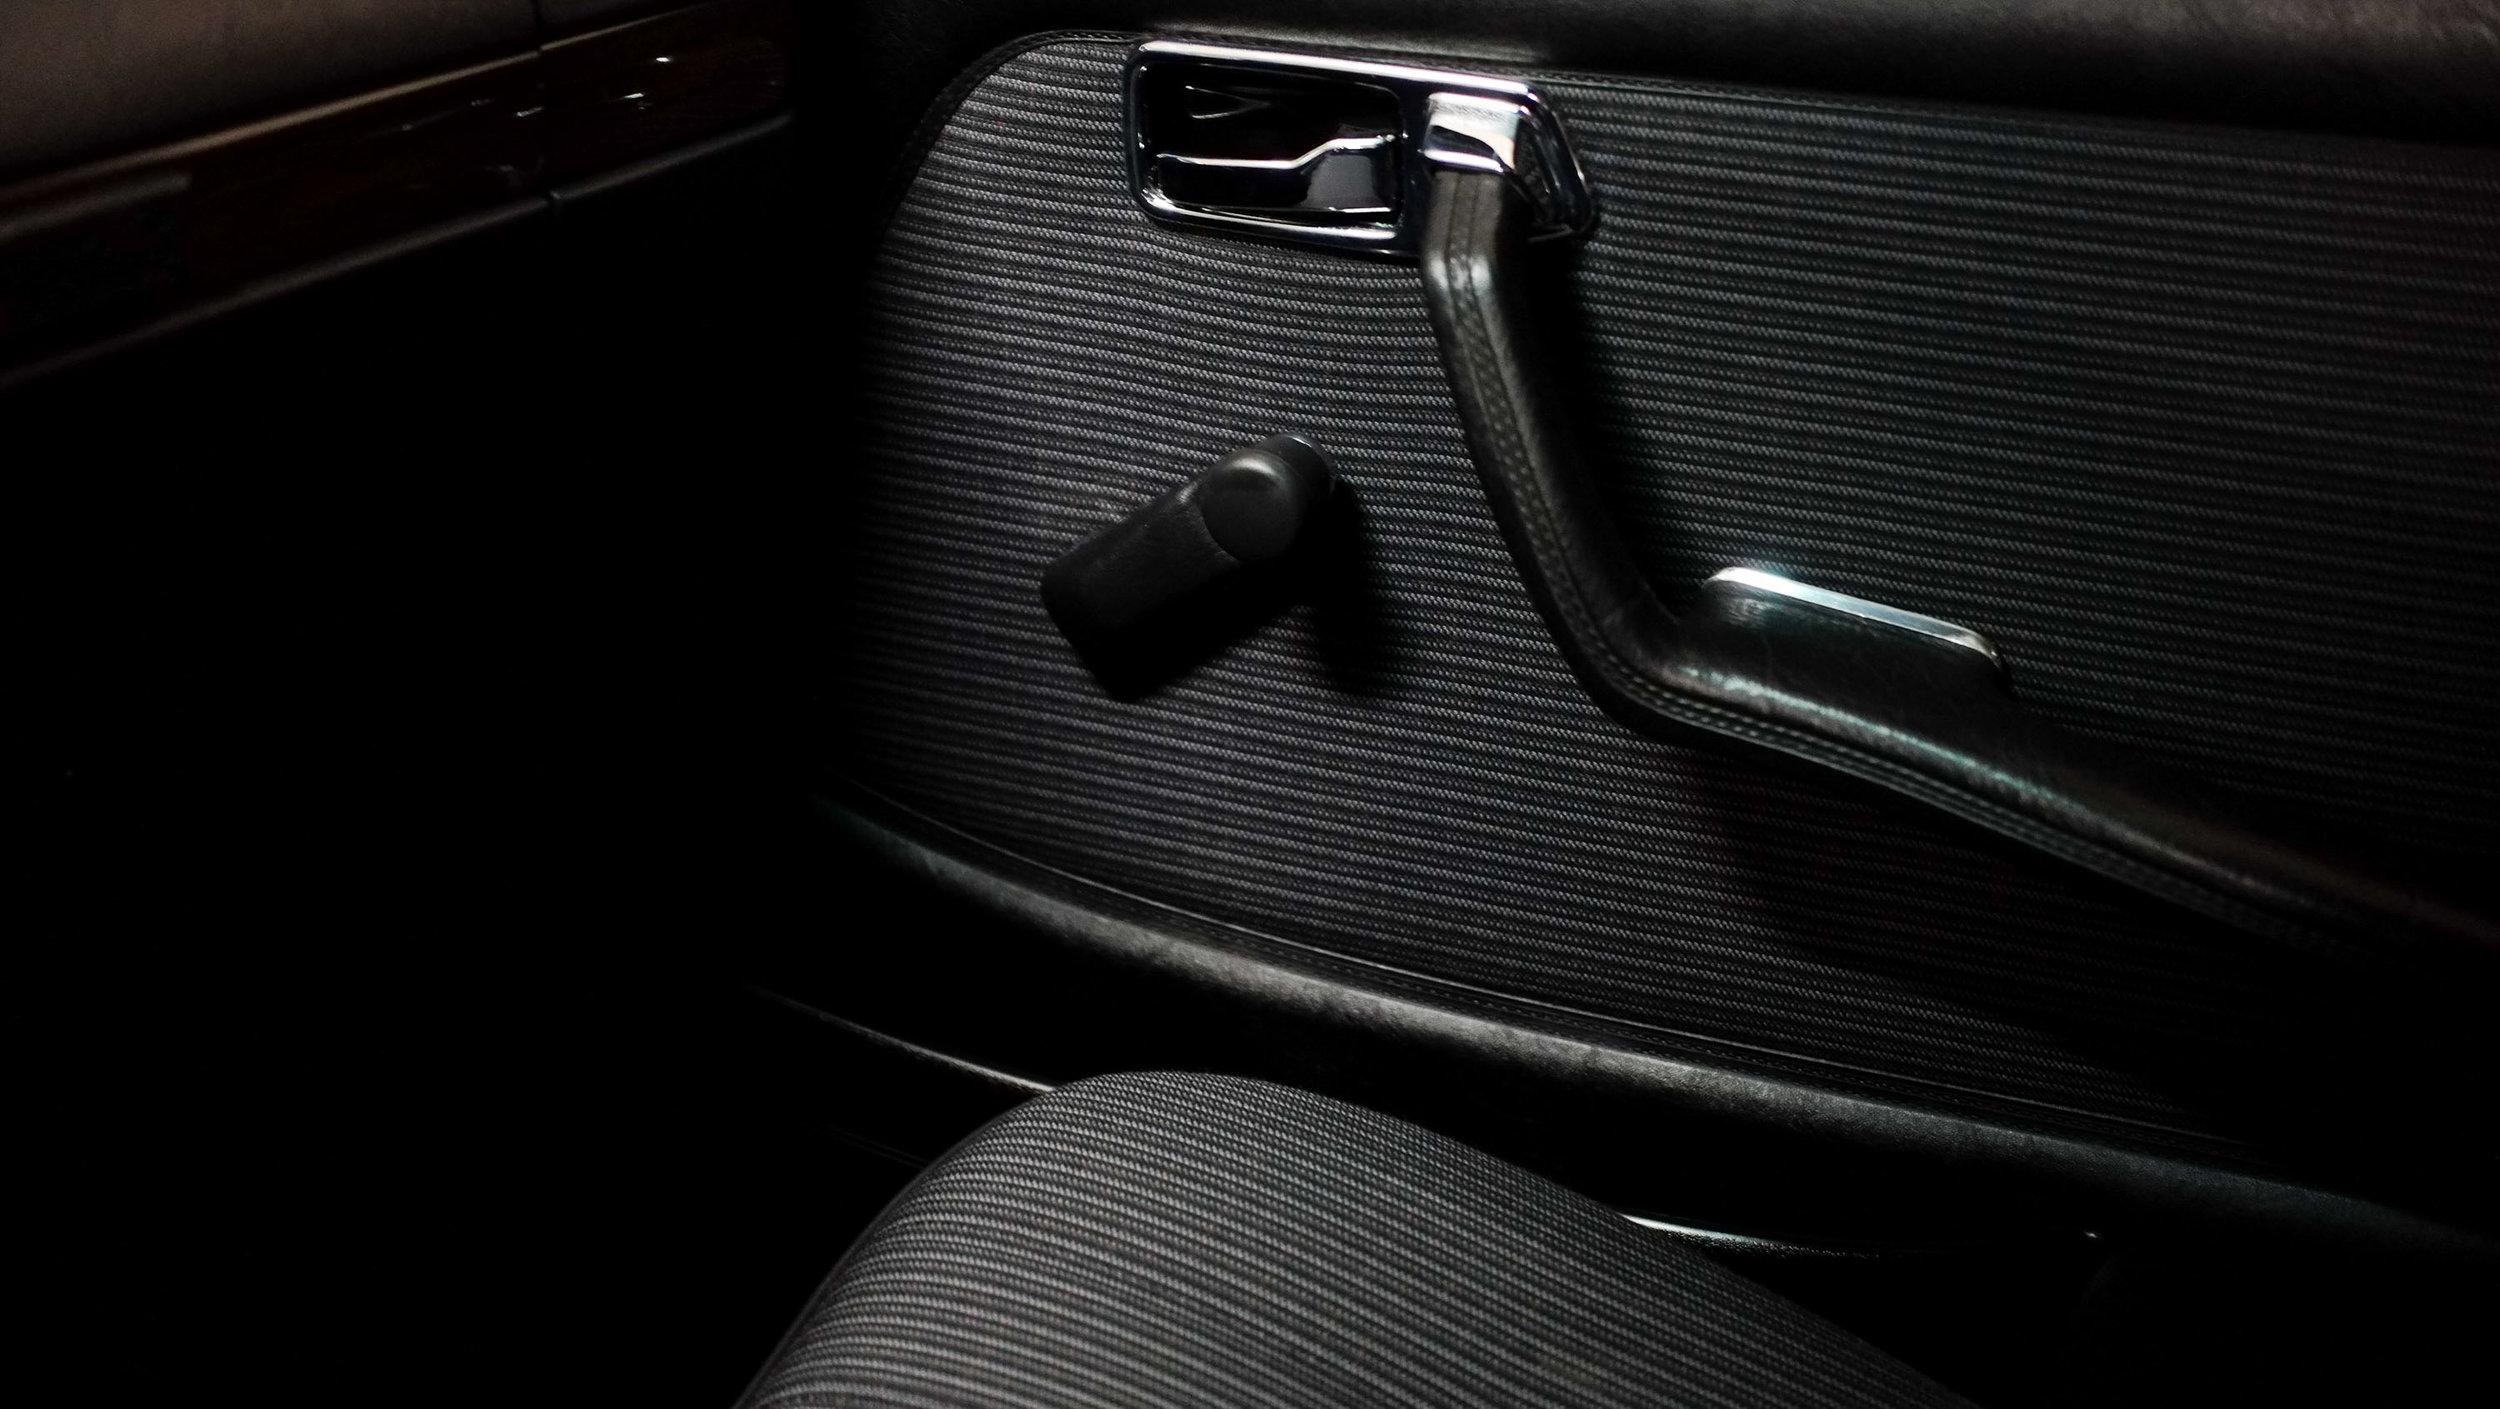 coolnvintage Mercedes-Benz W123 300D (47 of 59).jpg